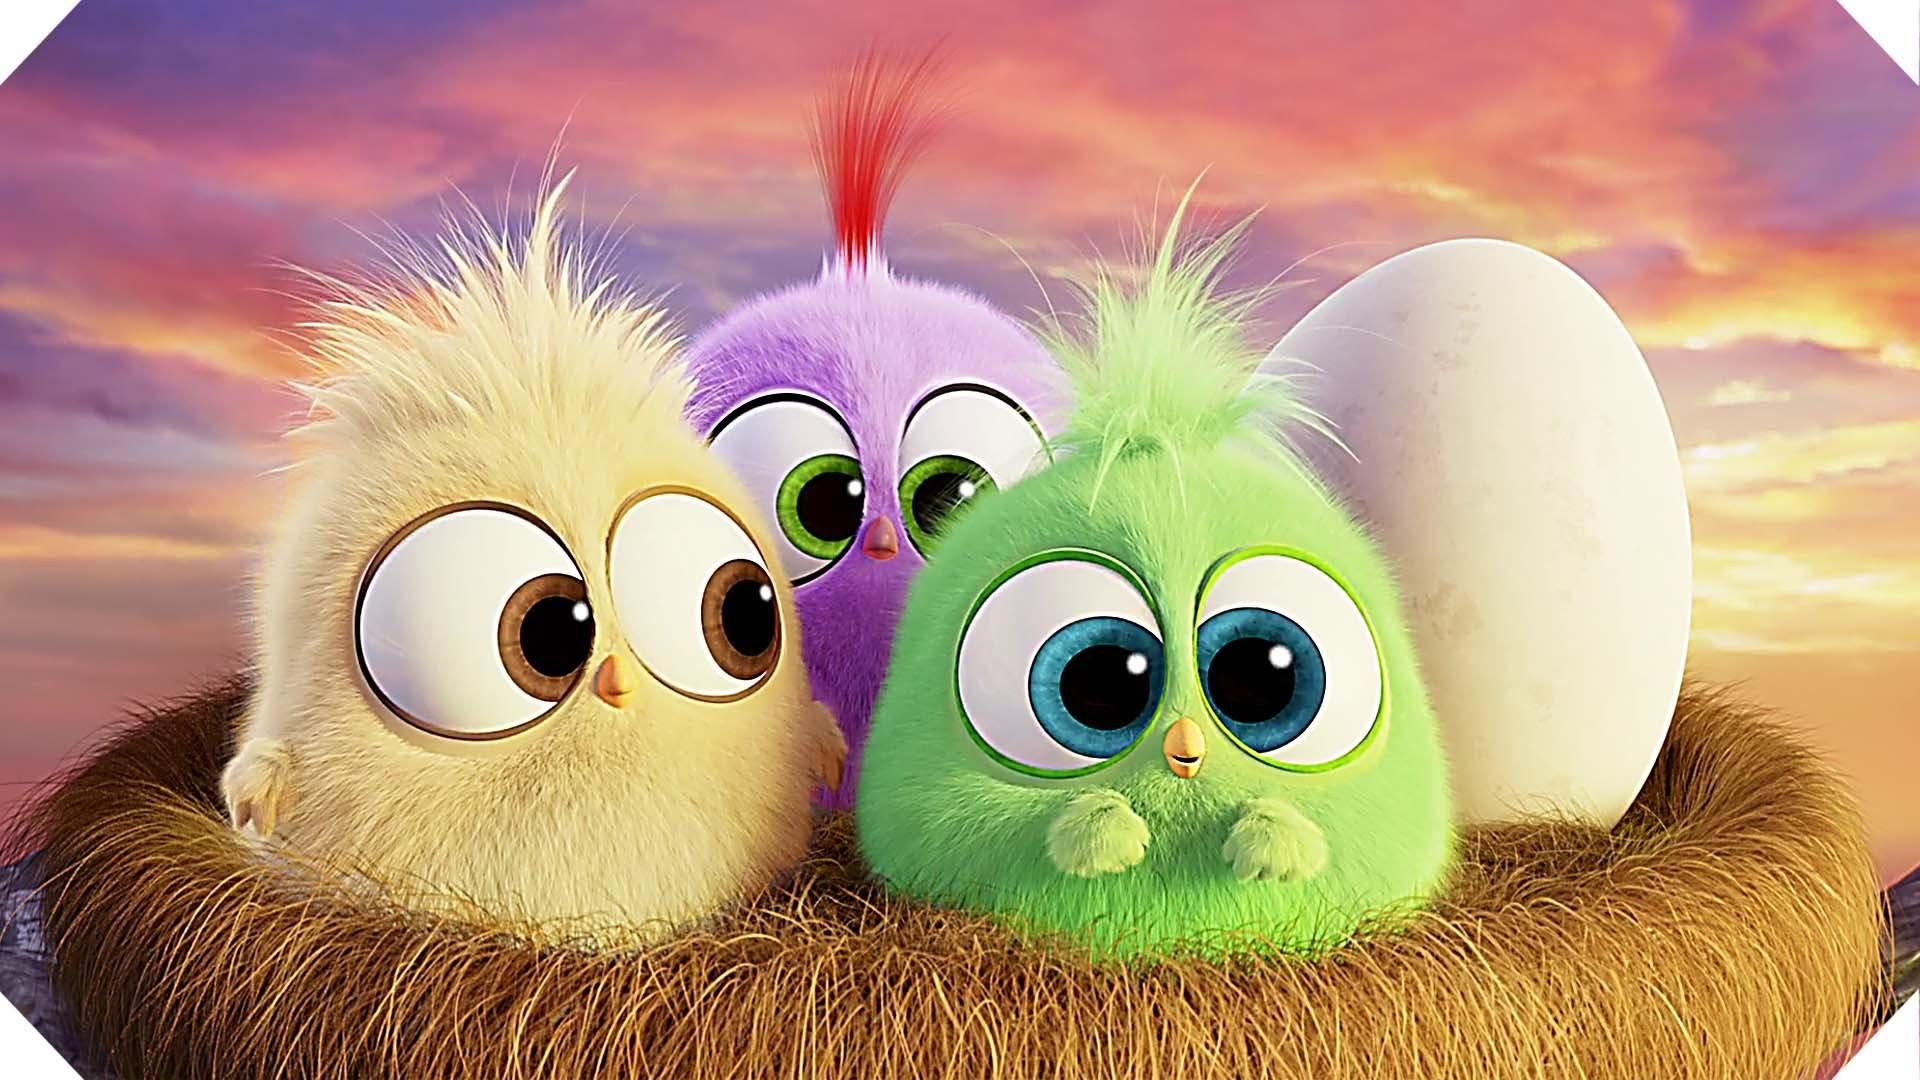 Angry Birds Hd Desktop Wallpapers Wallpaper Cave